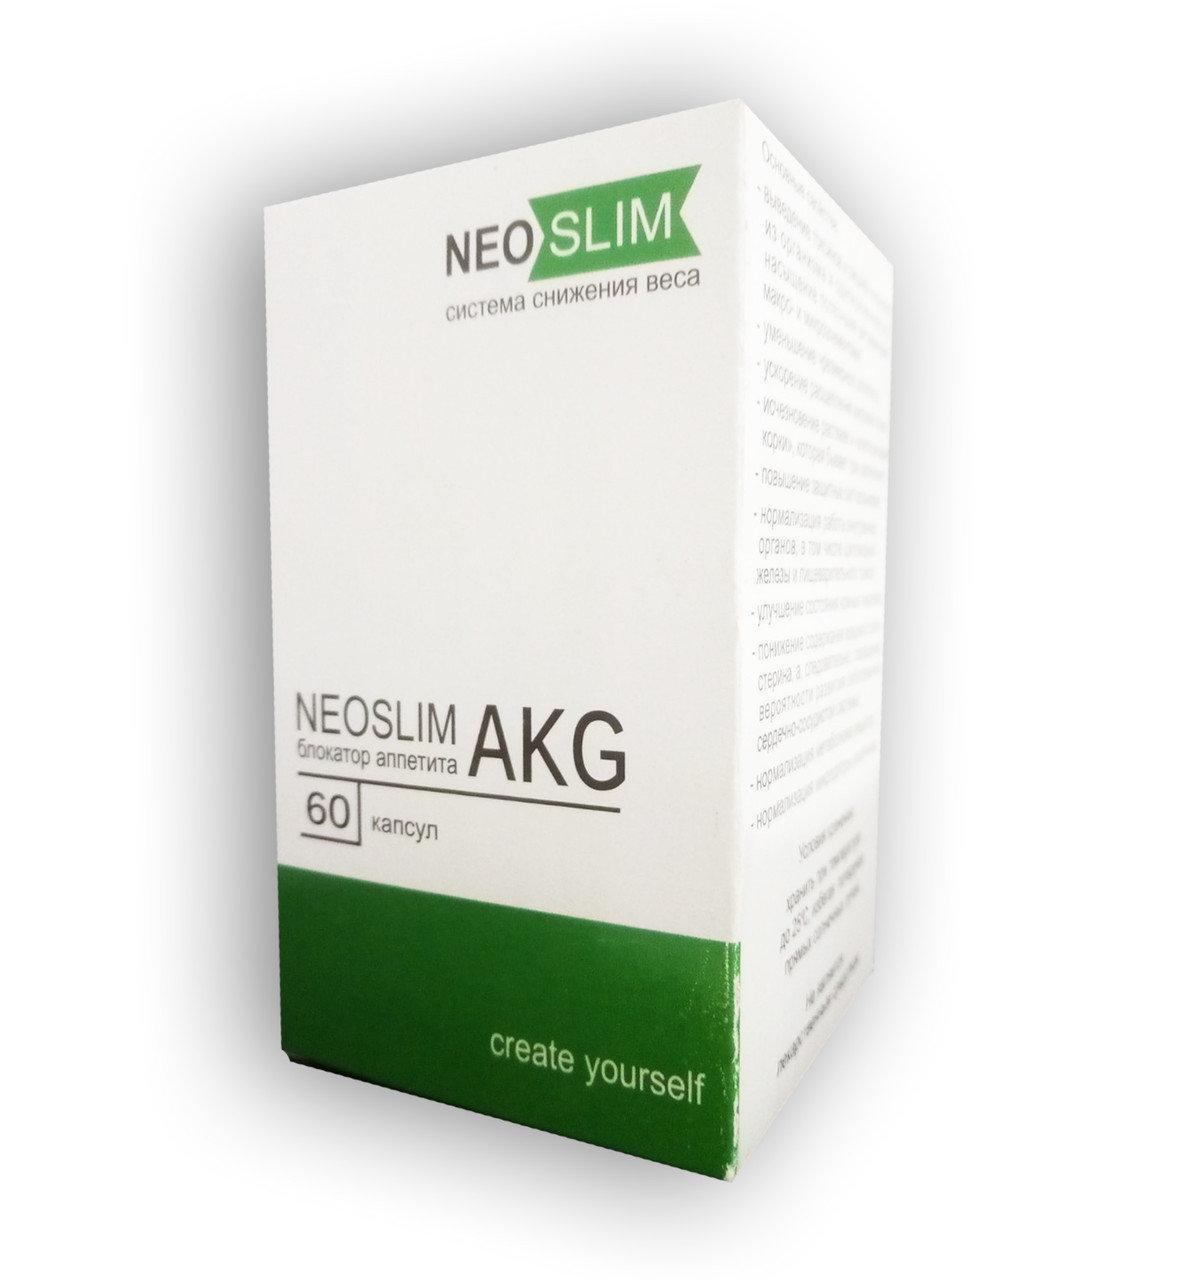 Neo Slim AKG (60) - Комплекс для снижения веса (Нео Слим АКГ) ViP